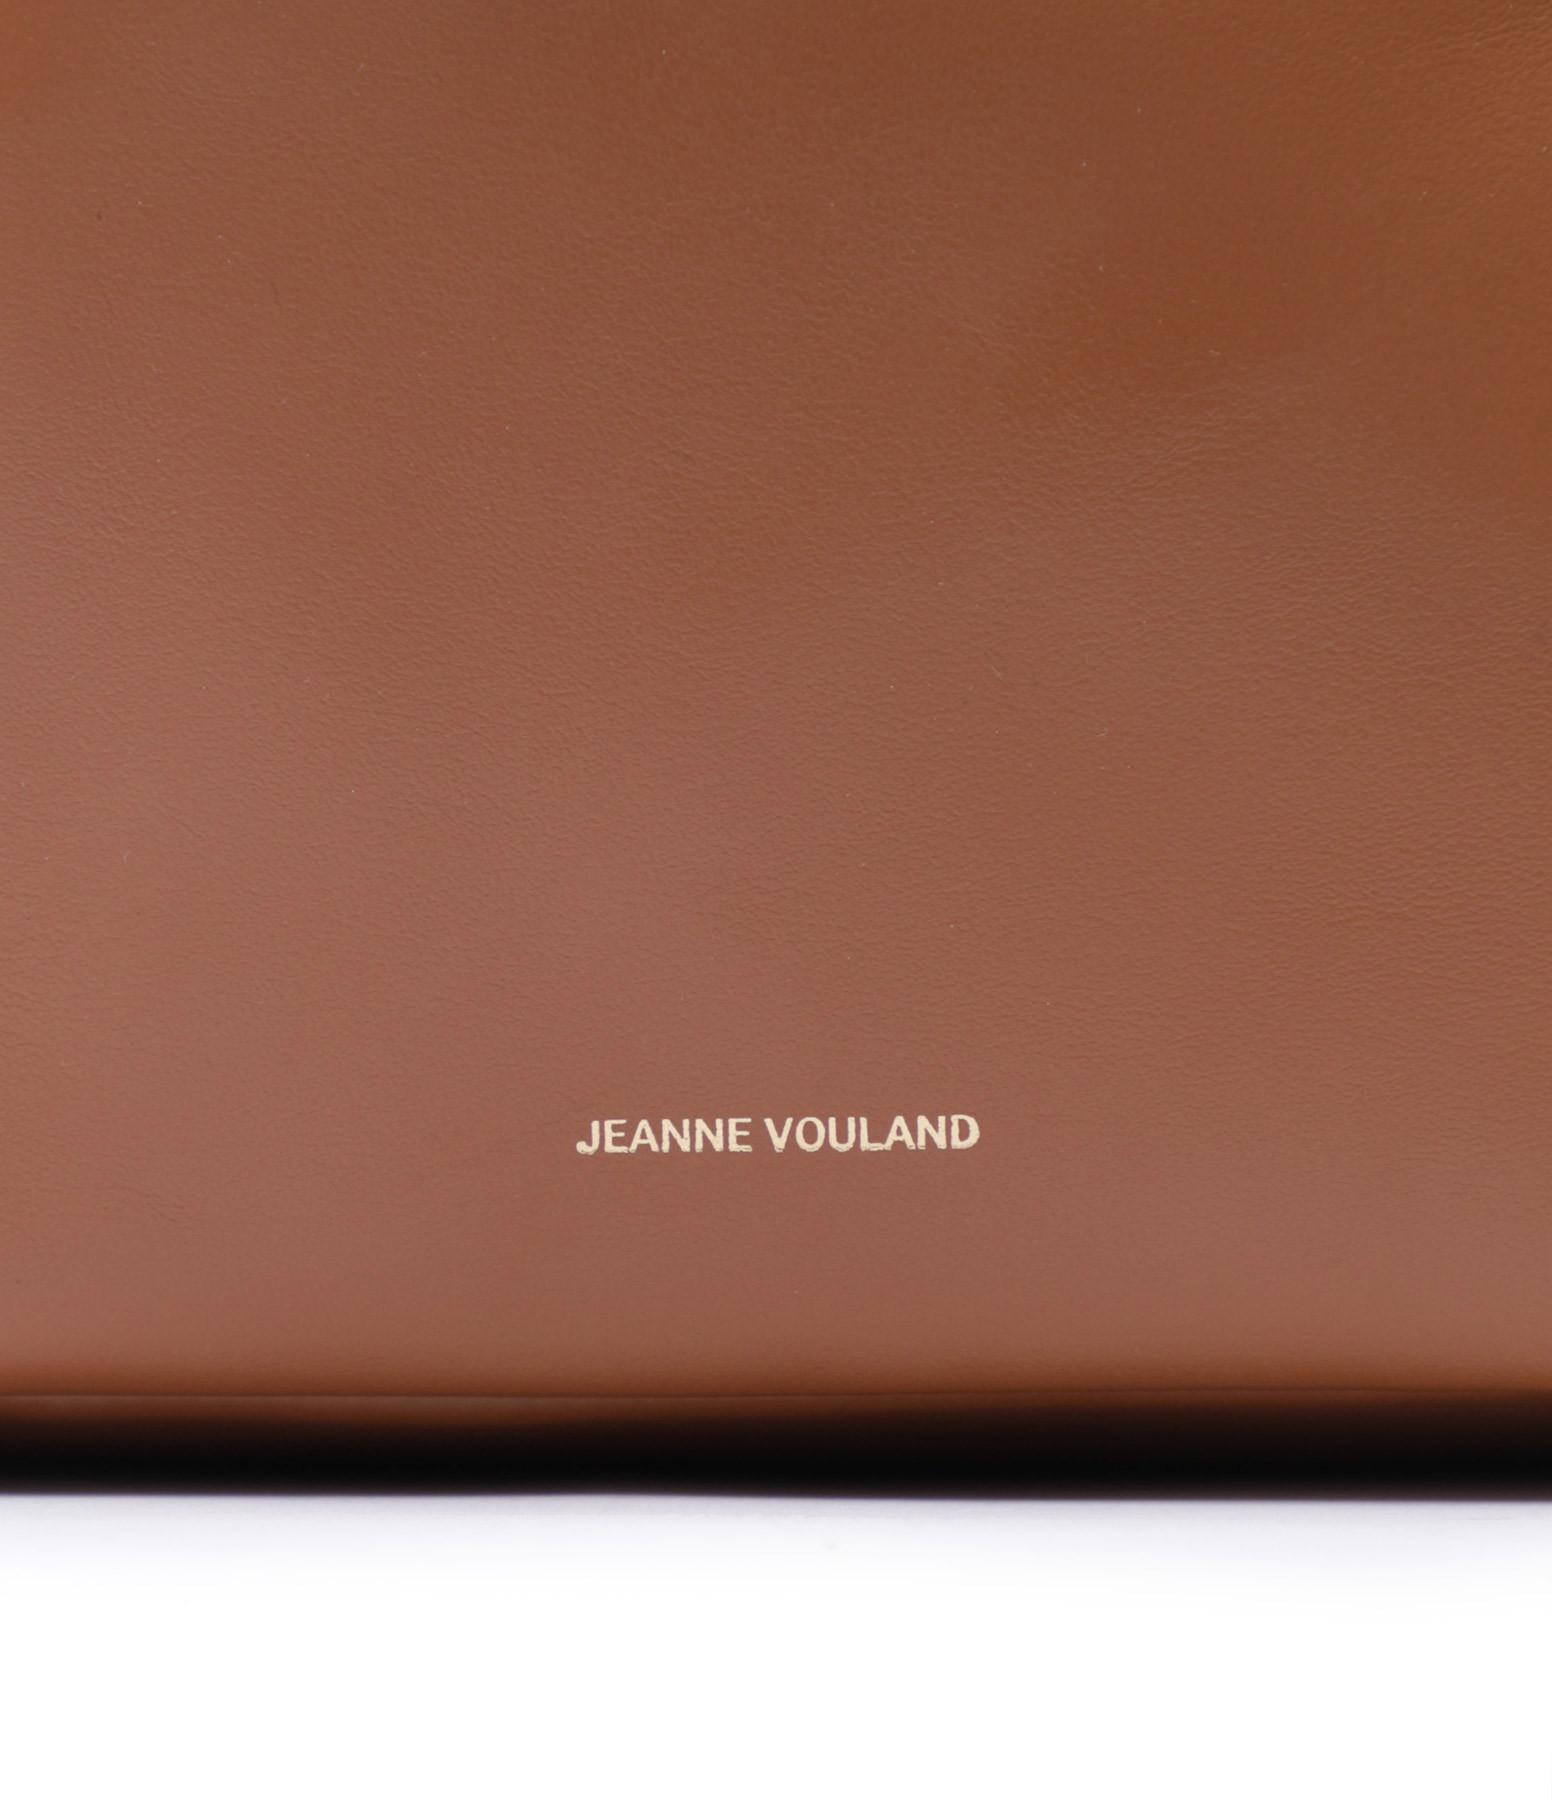 JEANNE VOULAND - Sac Seau San Cuir Lisse Camel